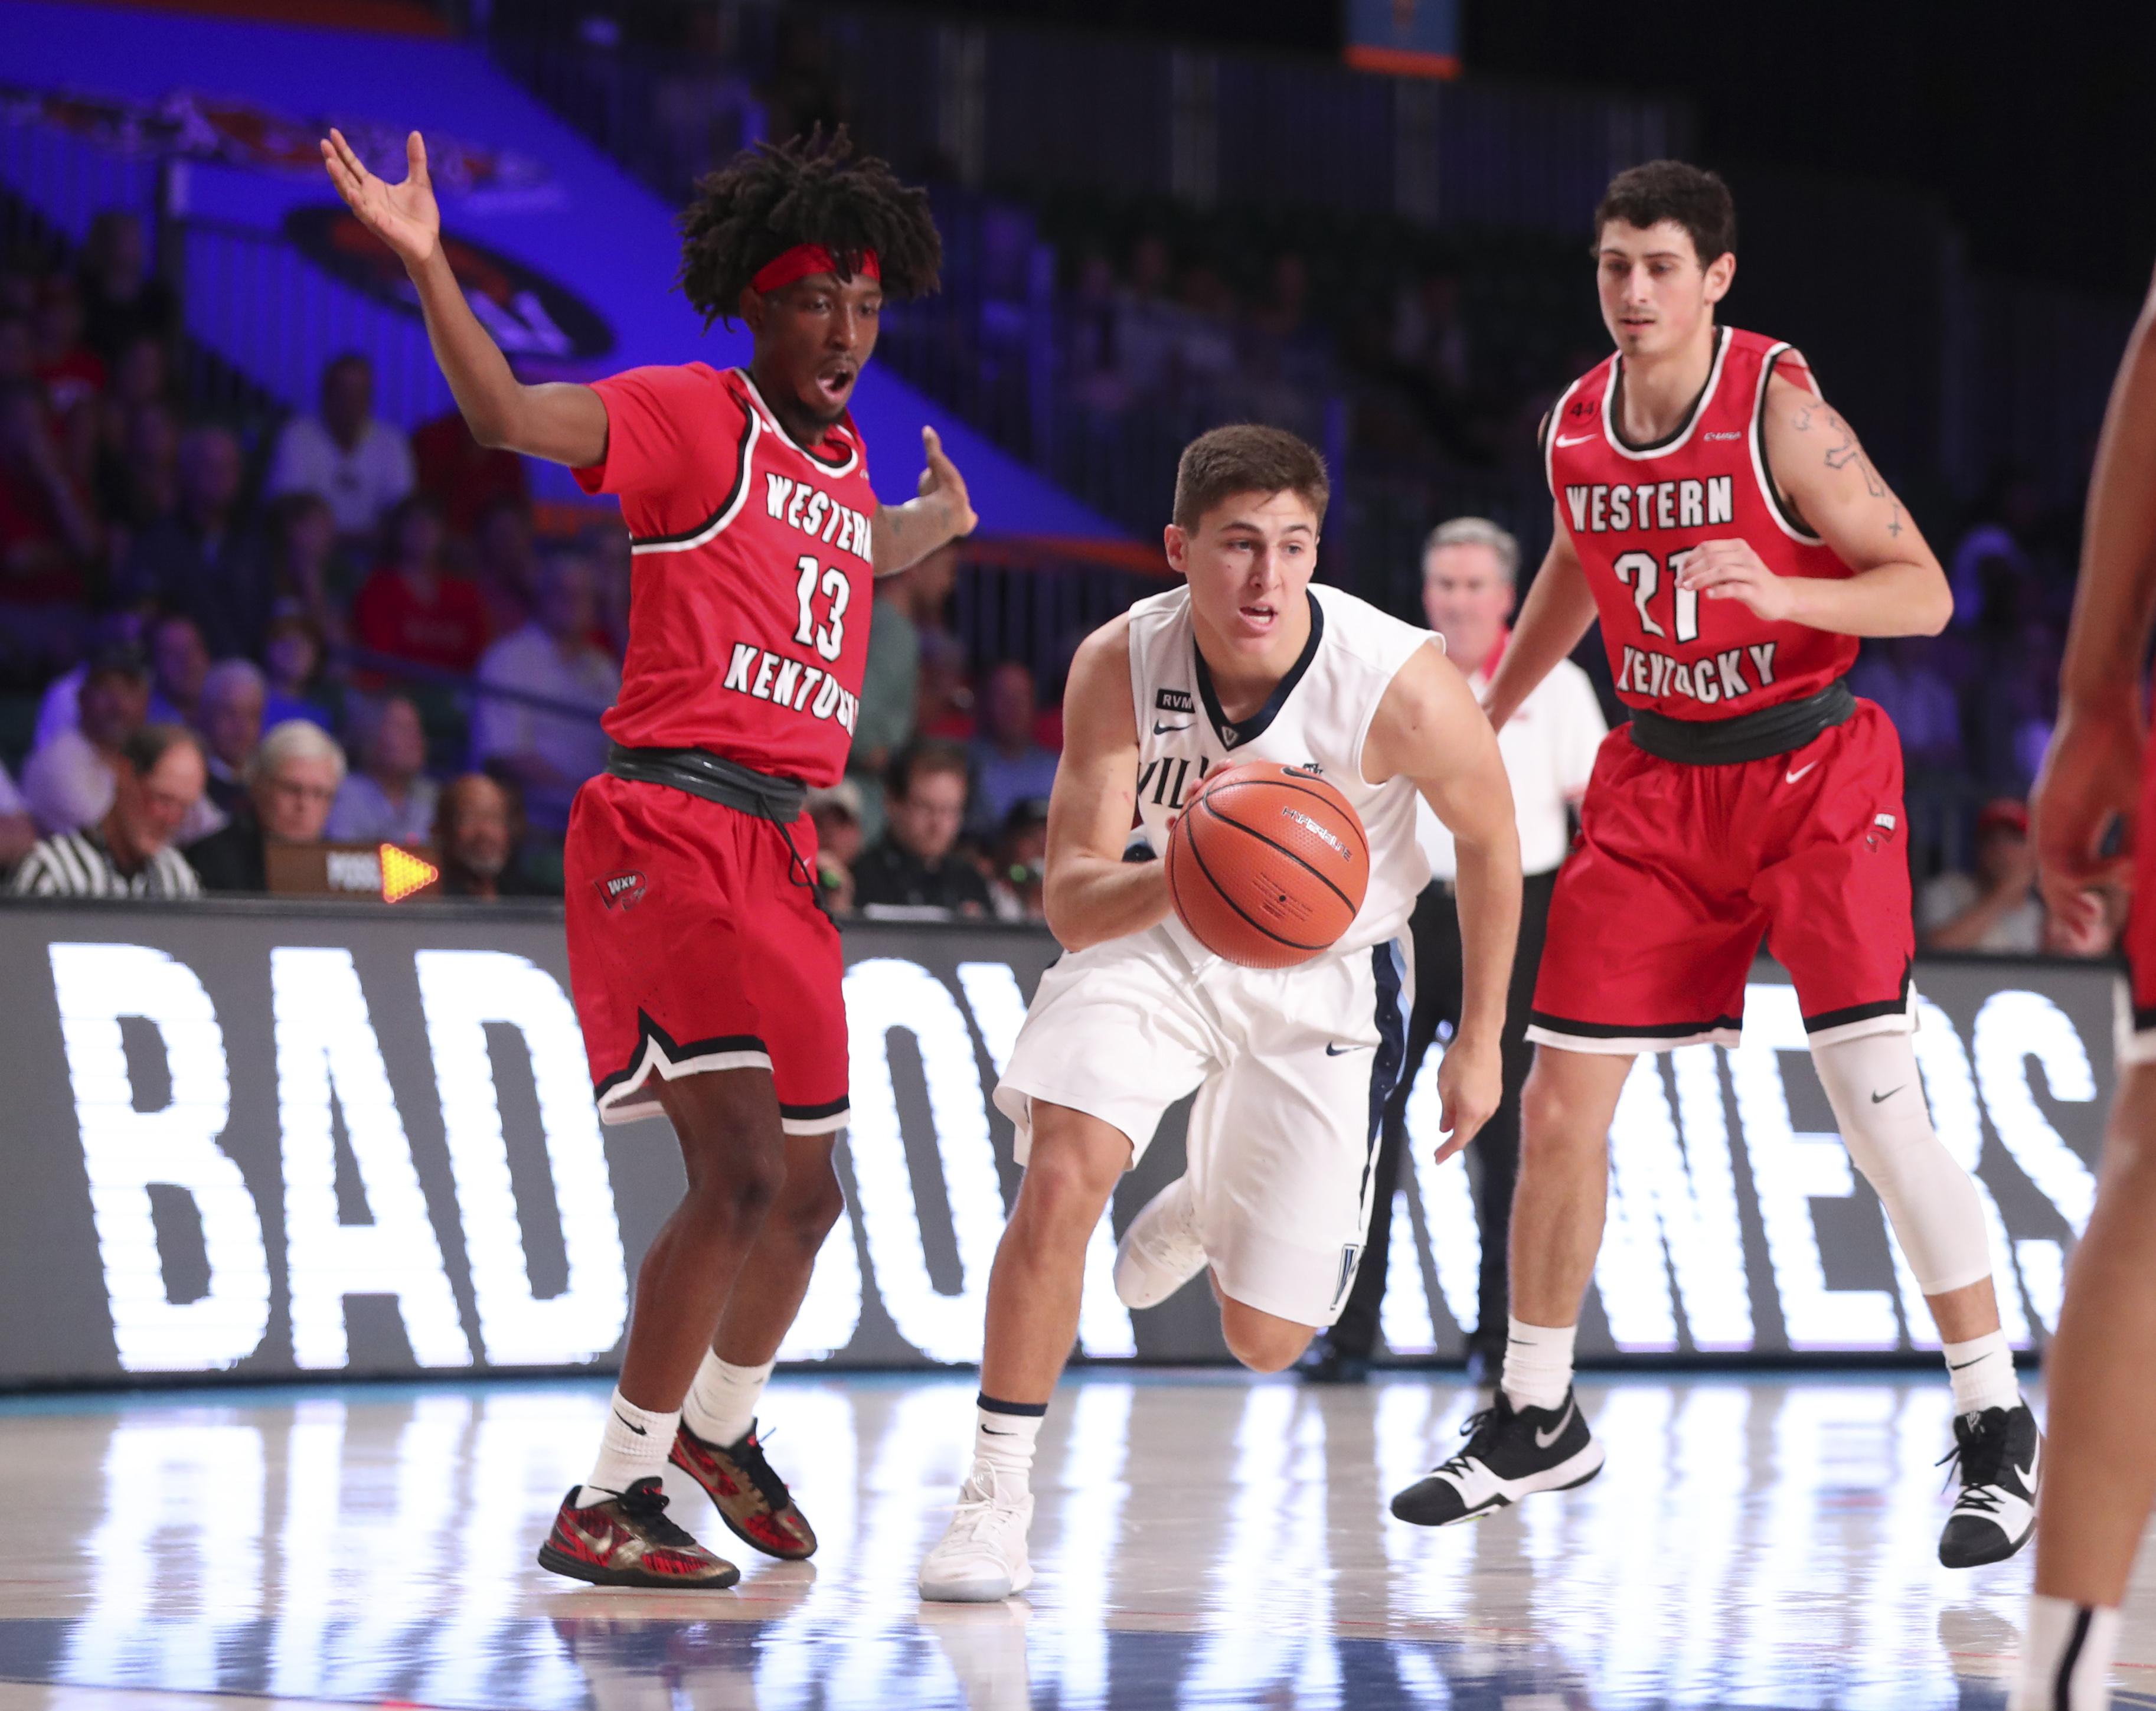 NCAA Basketball: Battle 4 Atlantis-Villanova vs Western Kentucky